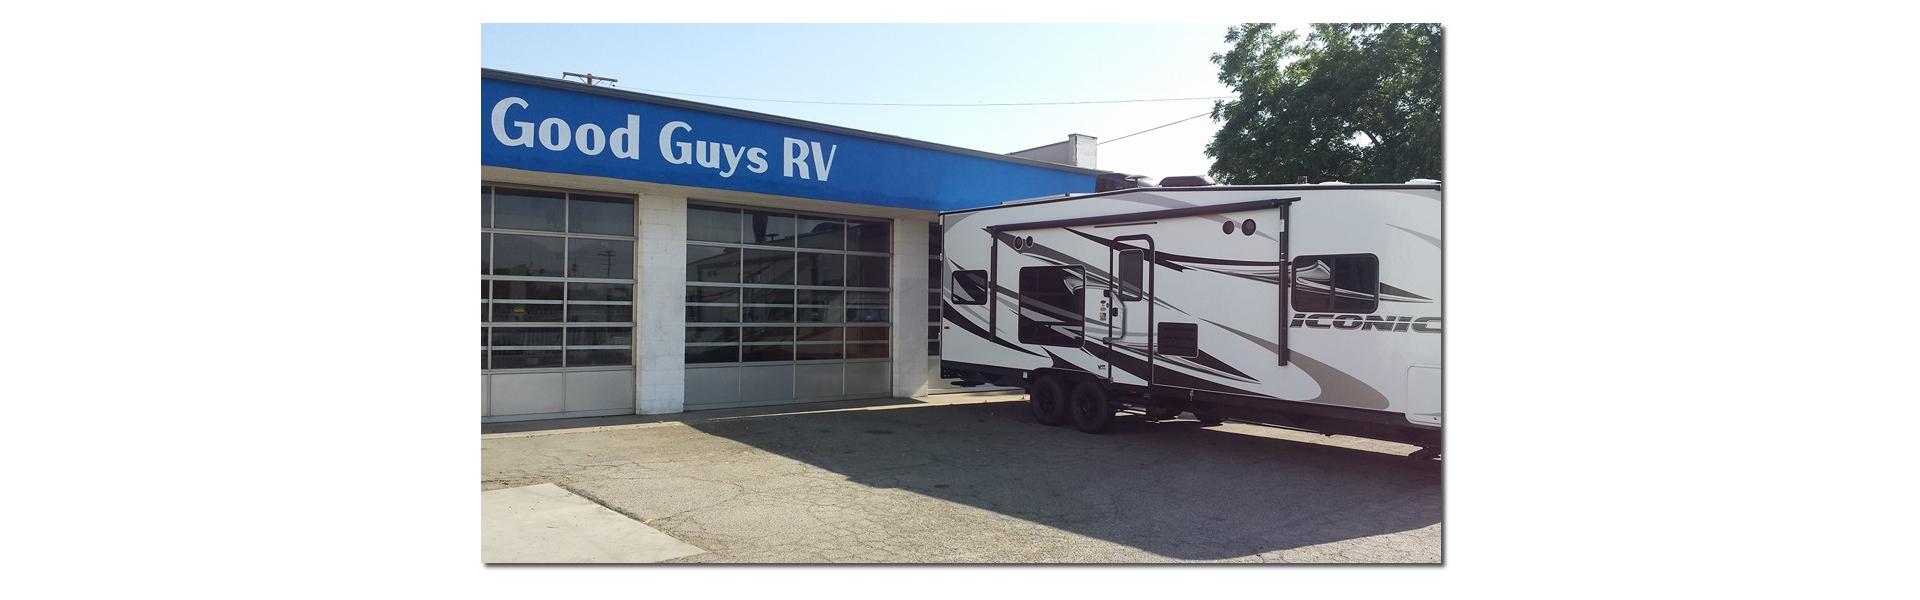 new used rv 39 s san bernardino ca new used travel trailers ca good guys rv. Black Bedroom Furniture Sets. Home Design Ideas